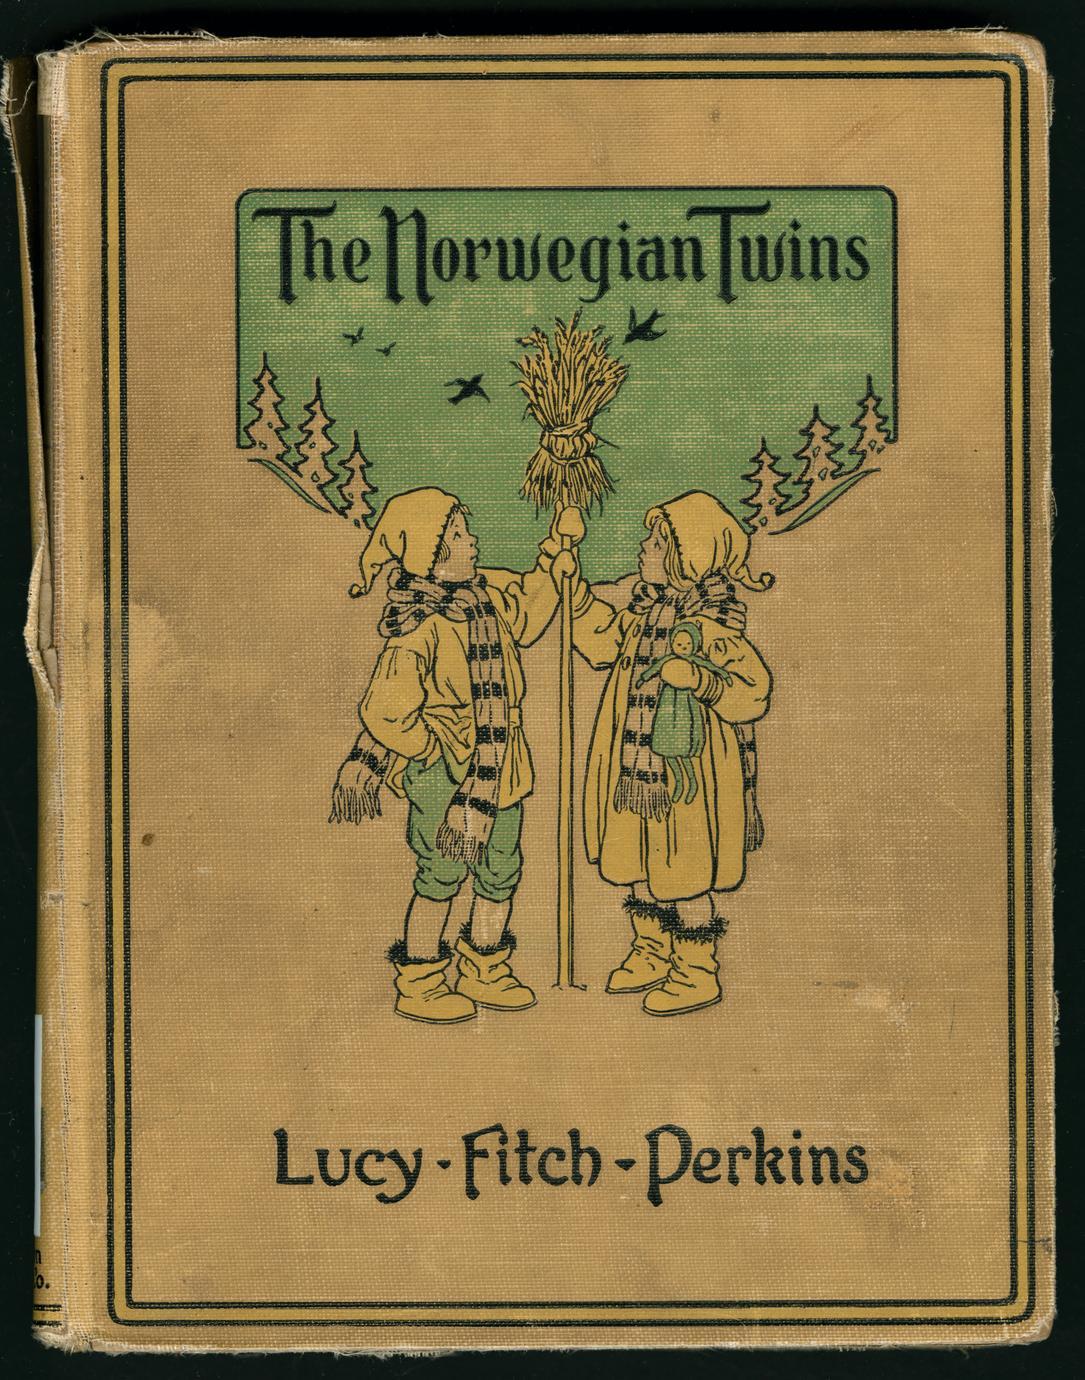 The Norwegian twins (1 of 4)